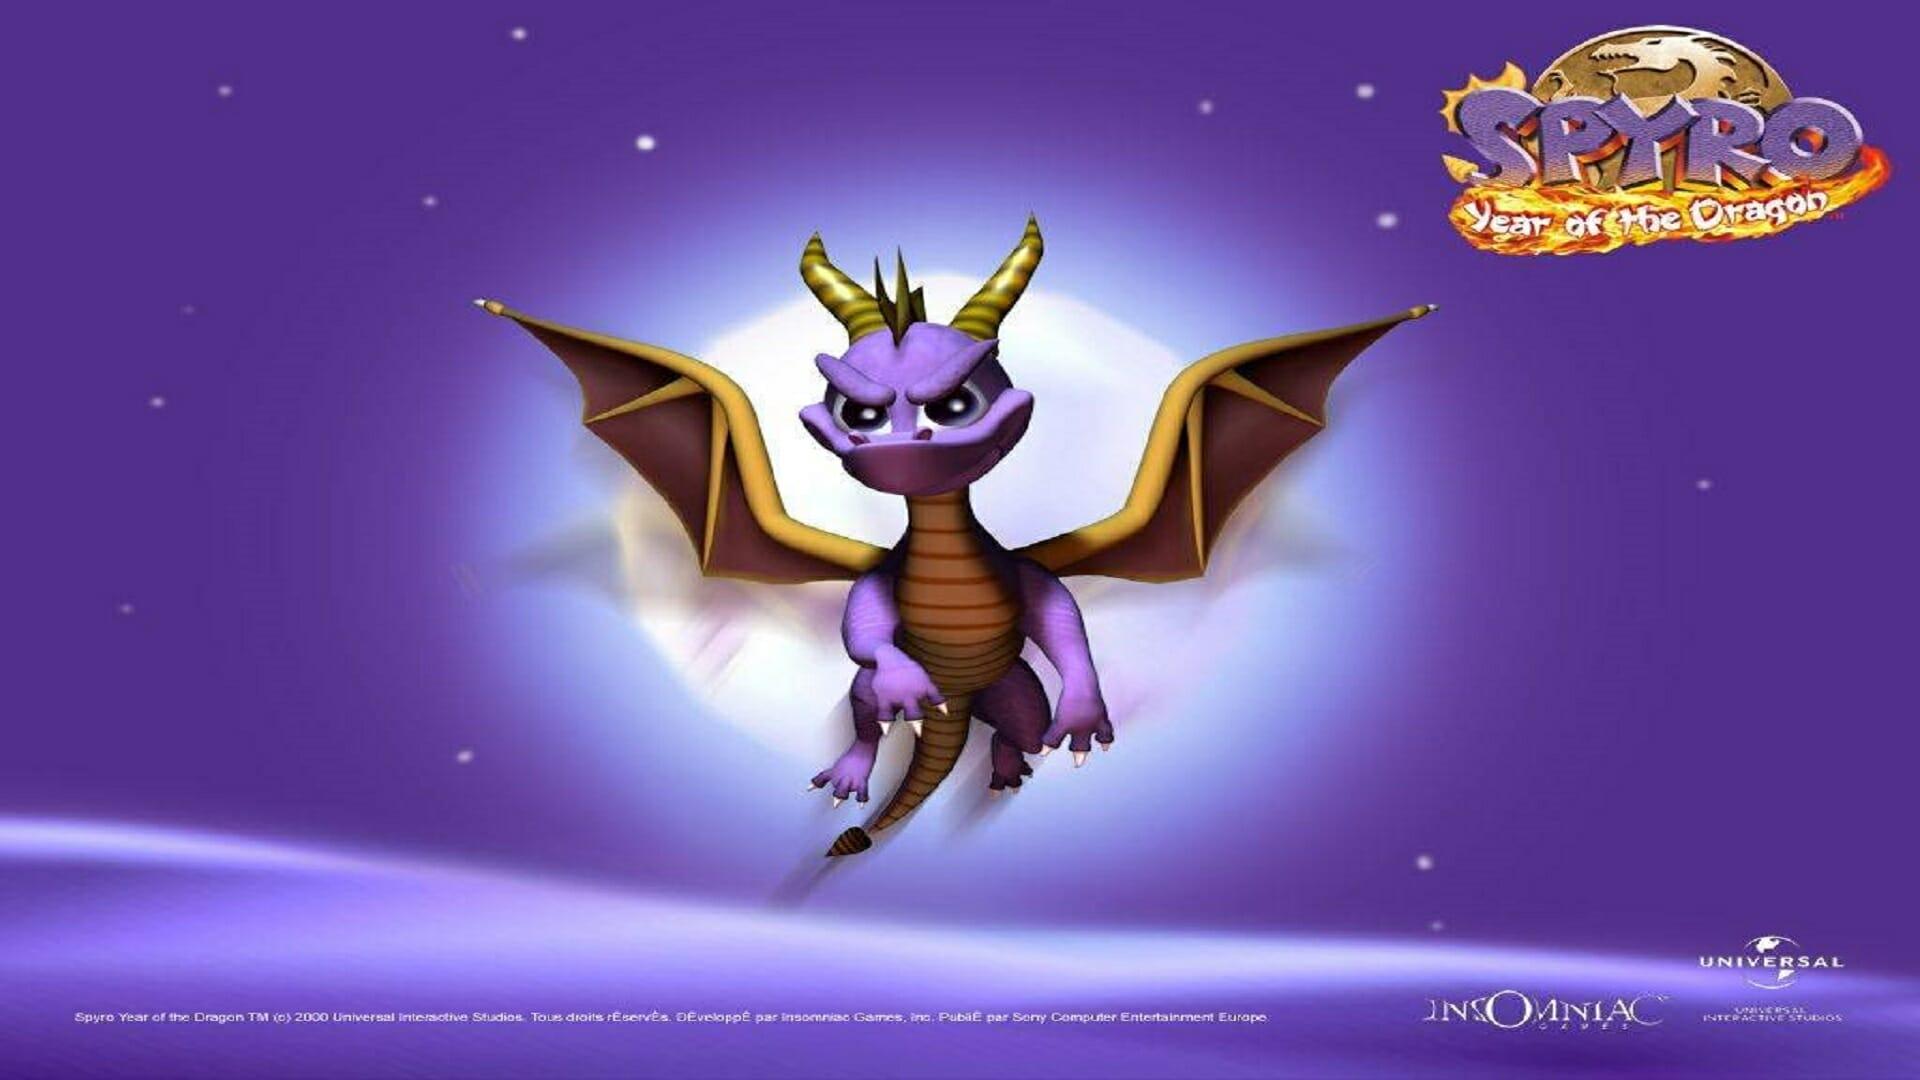 Retro Review - Spyro: Year of the Dragon - BagoGames